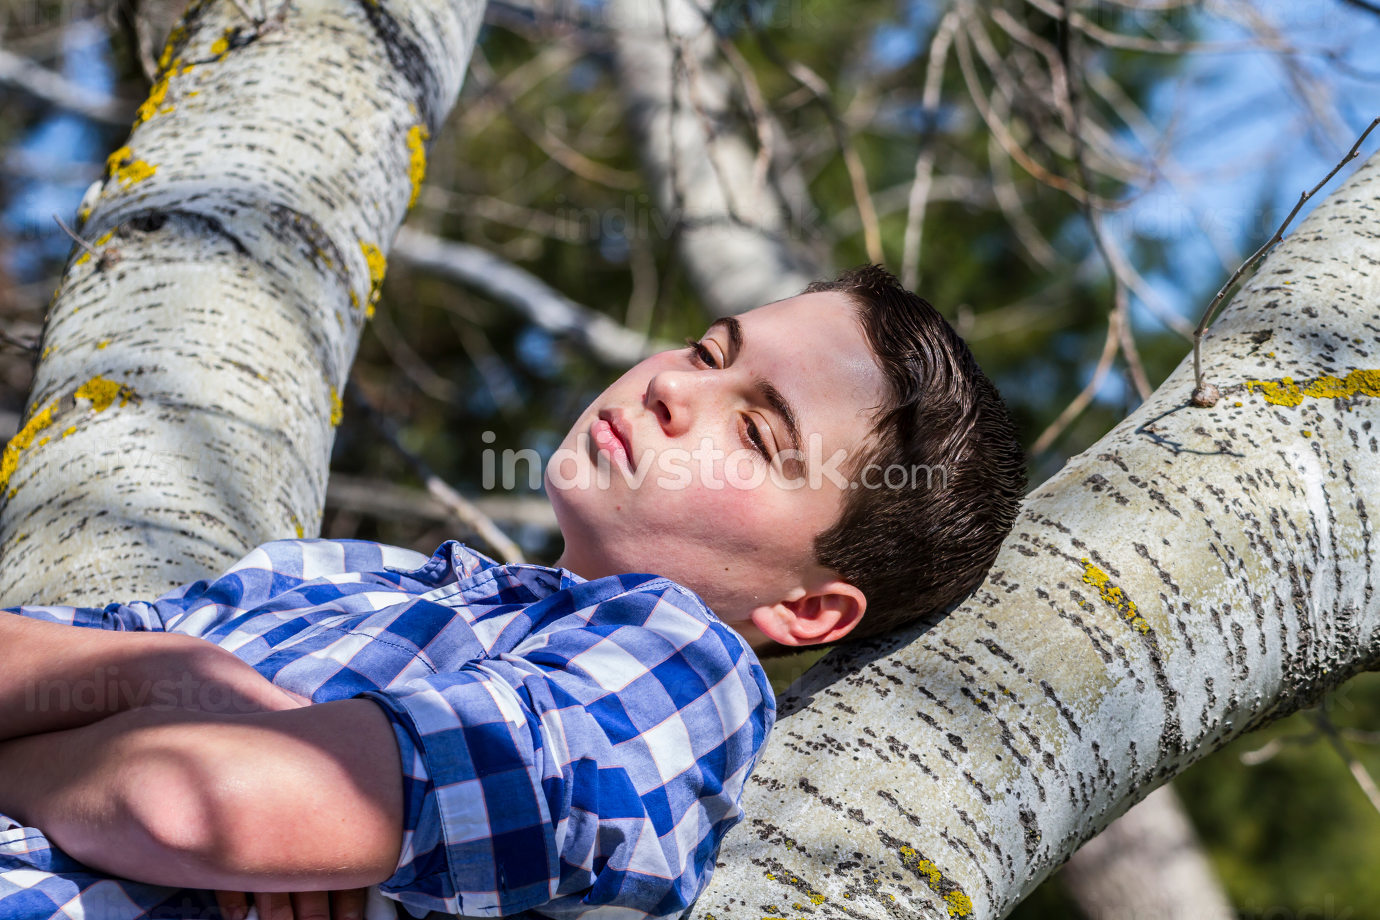 Handsome.A young boy dressed in western attire, outdoor park, su